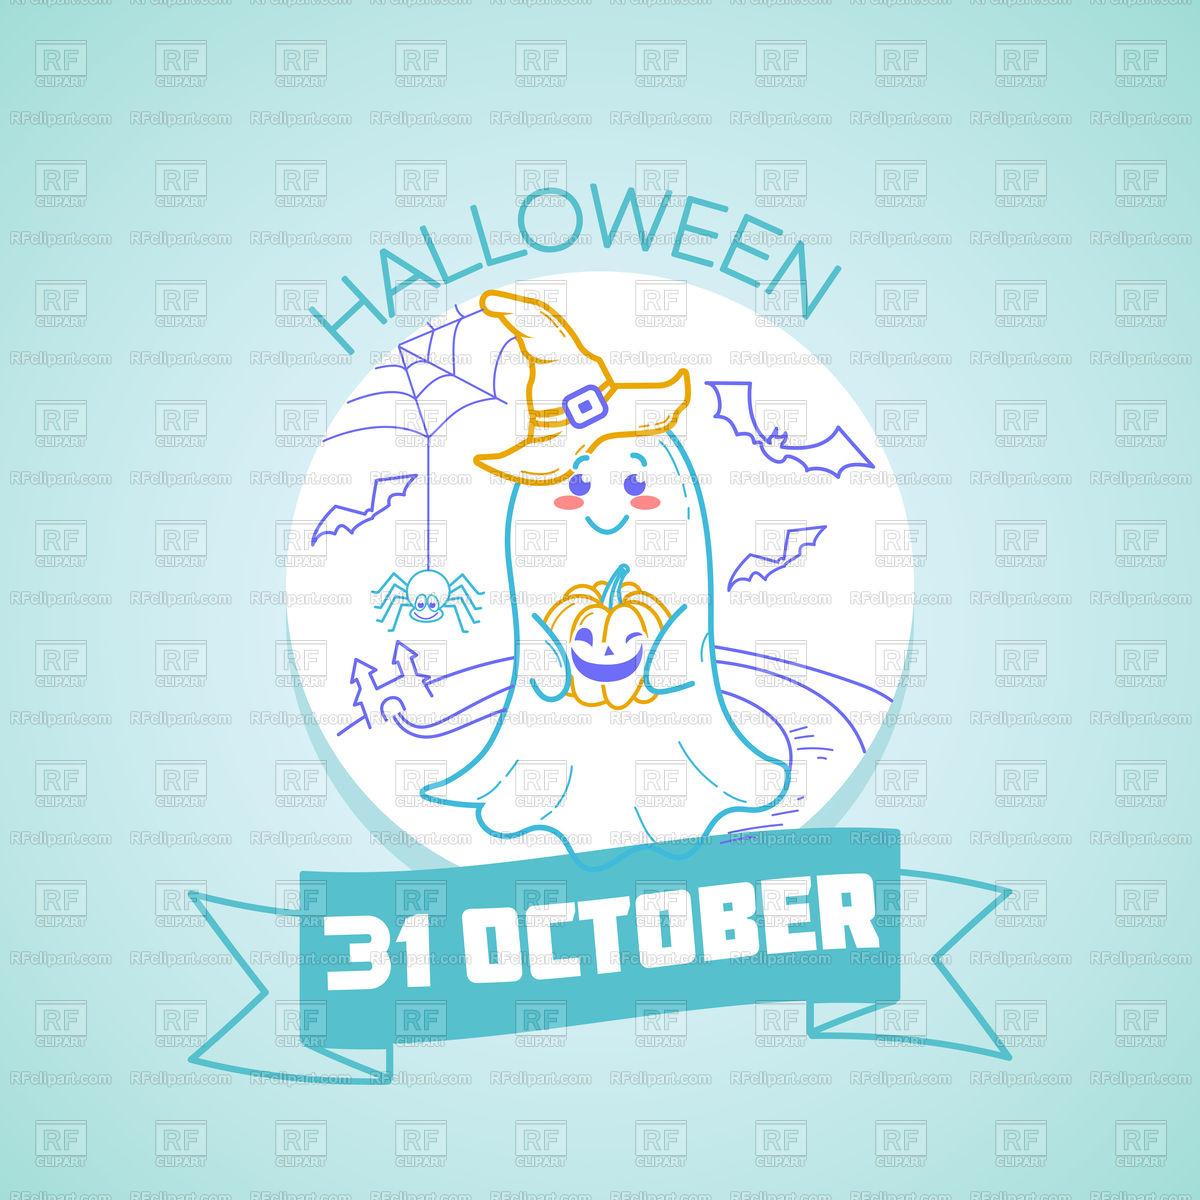 Calendar for October 31. Holiday.